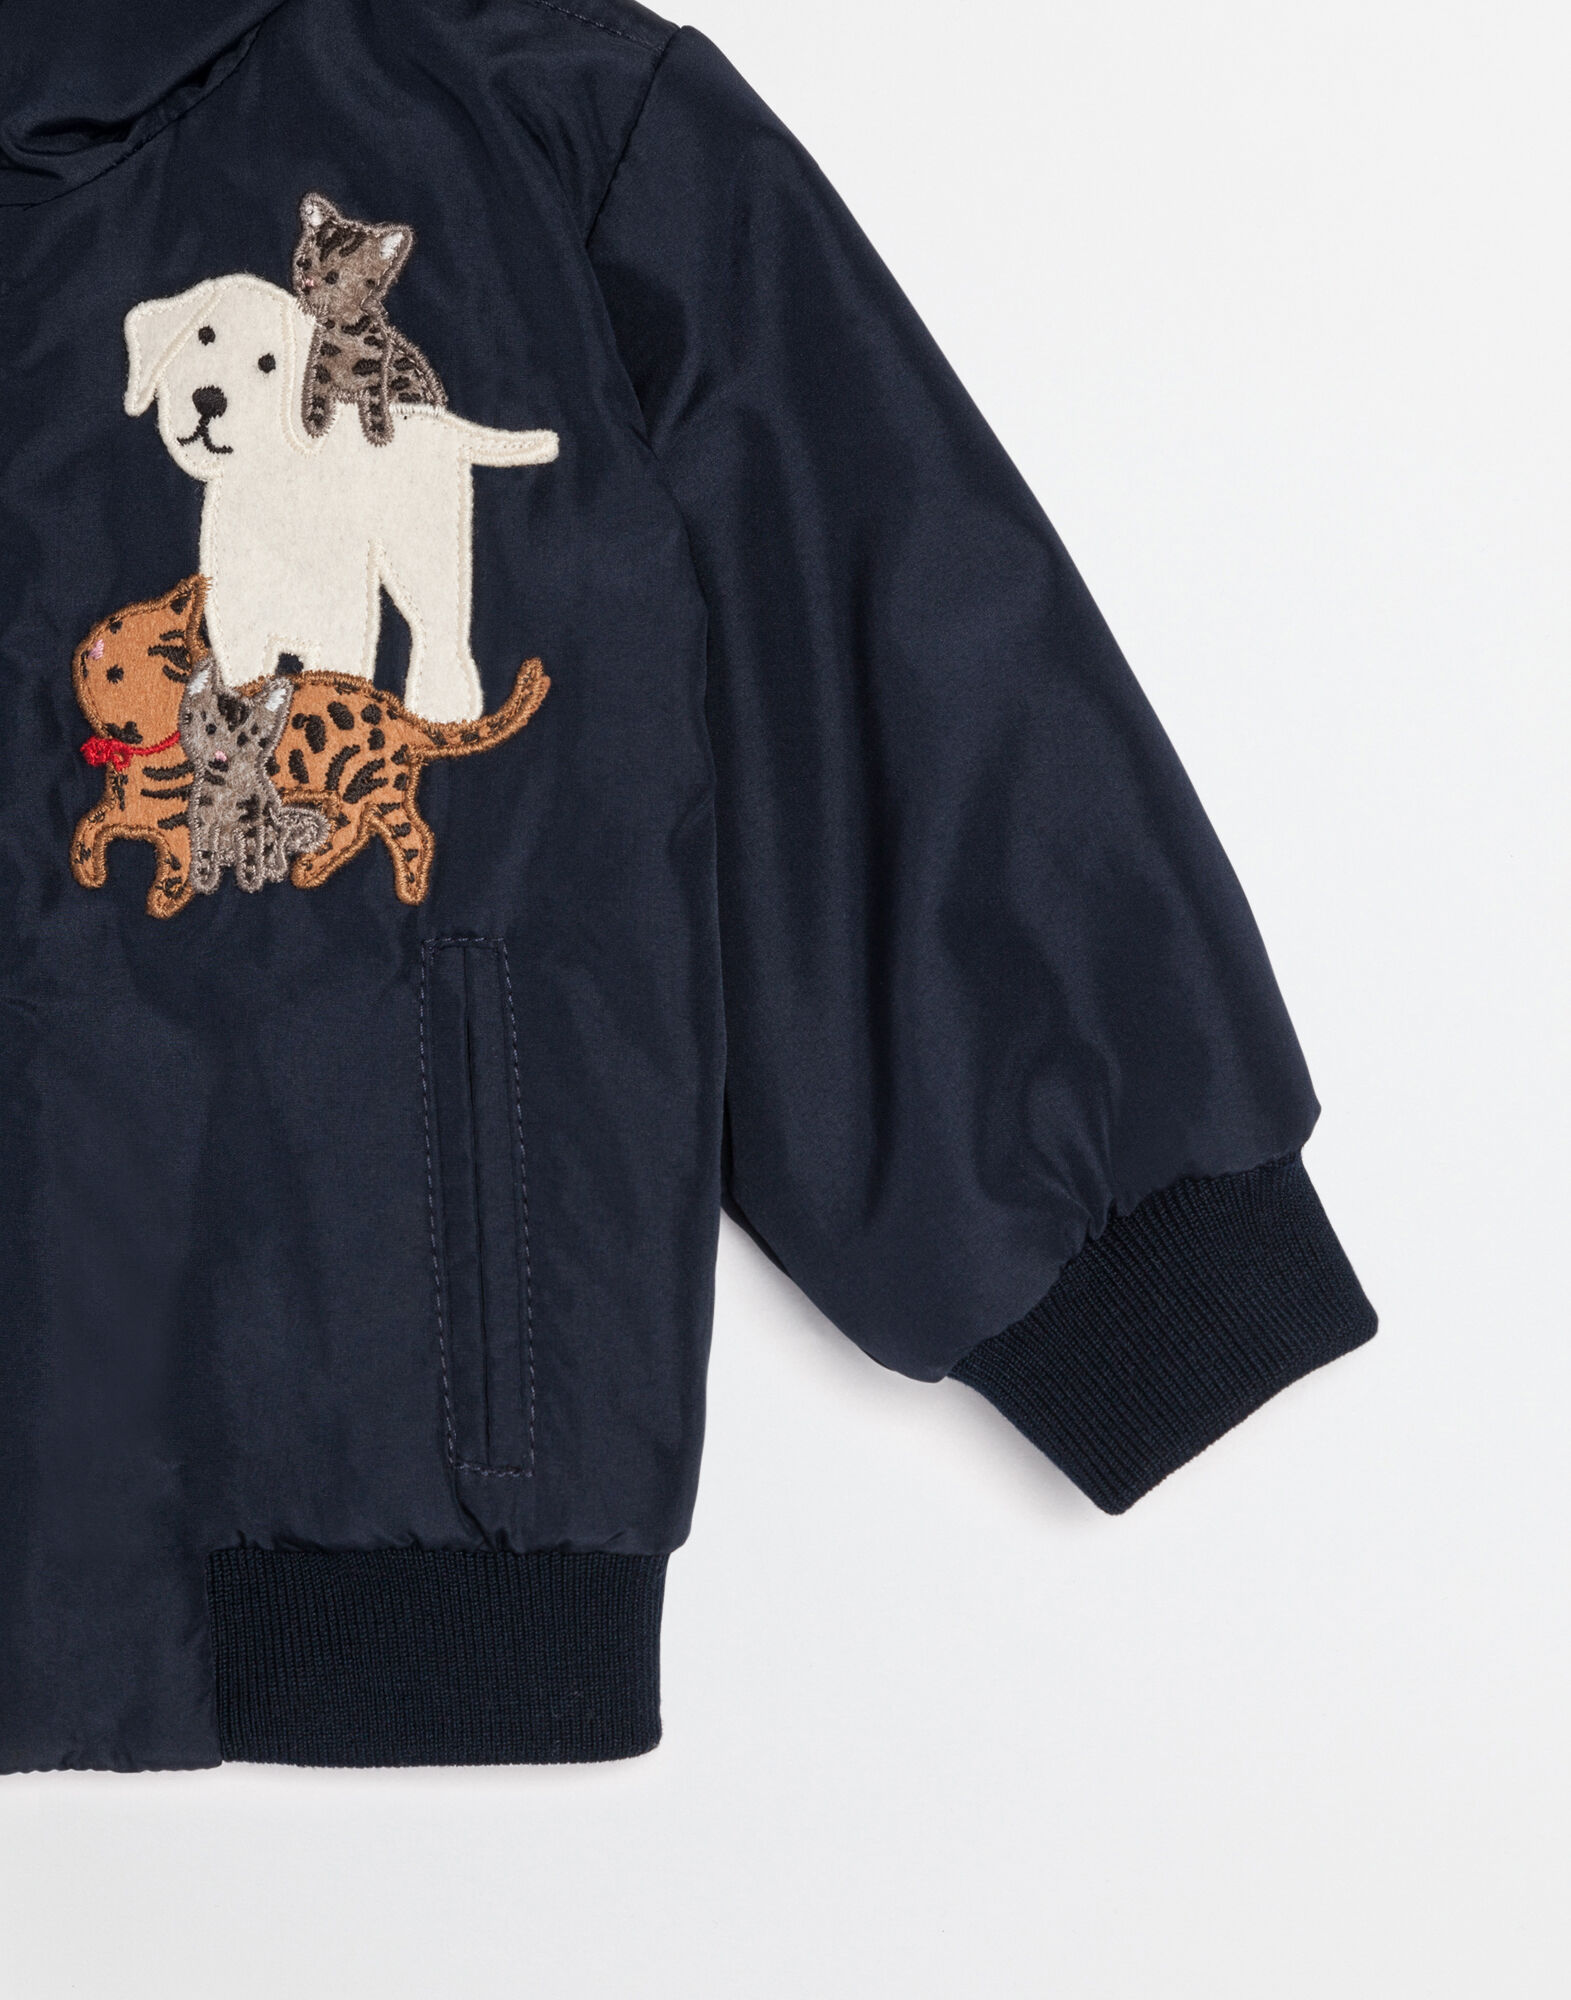 Dolce&Gabbana NYLON BOMBER JACKET WITH PATCH